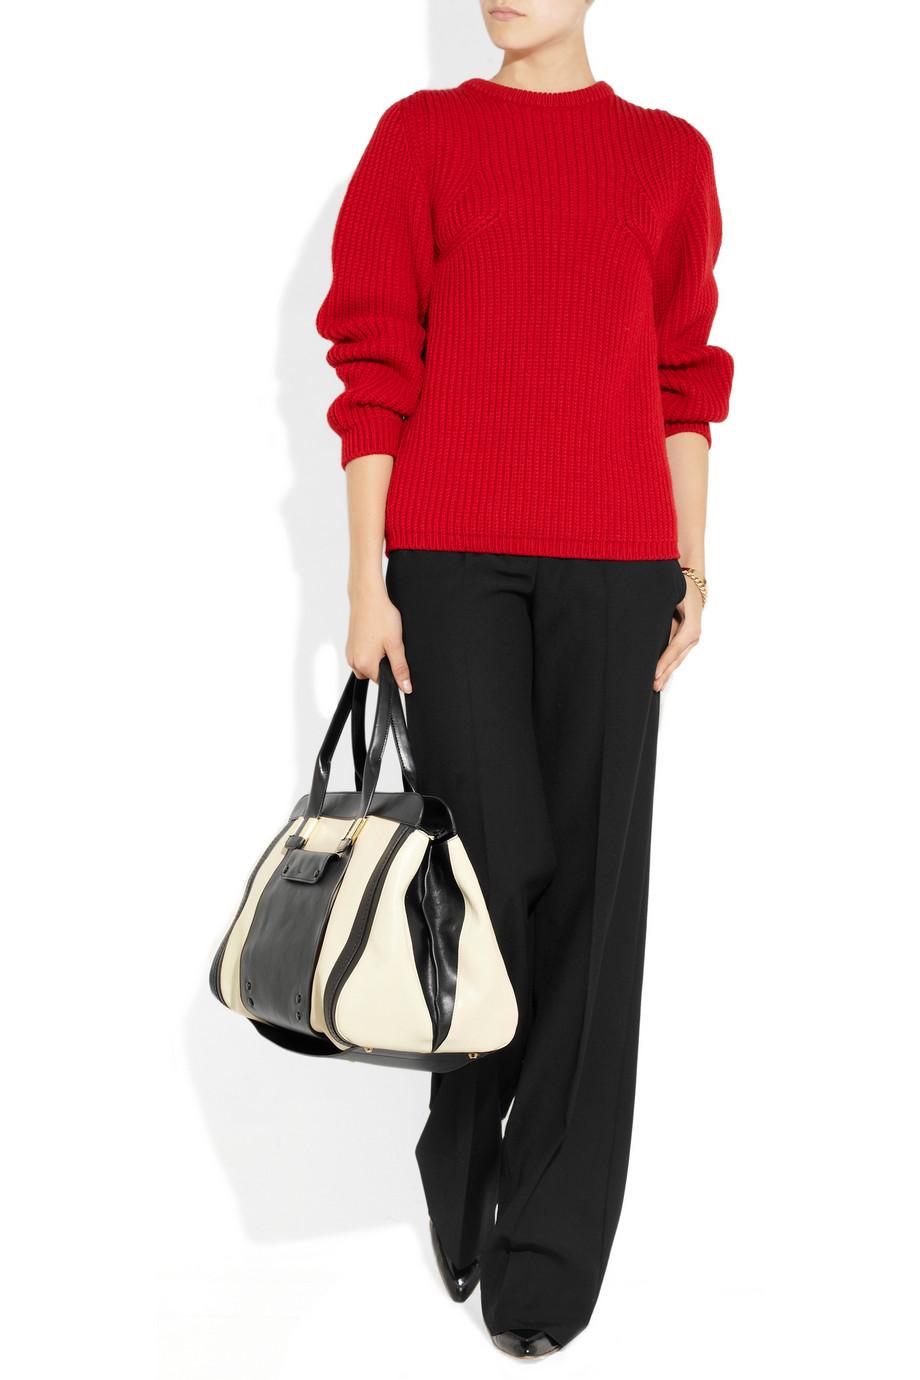 gray chloe bag - chloe large alice tote, cheap replica chloe handbags